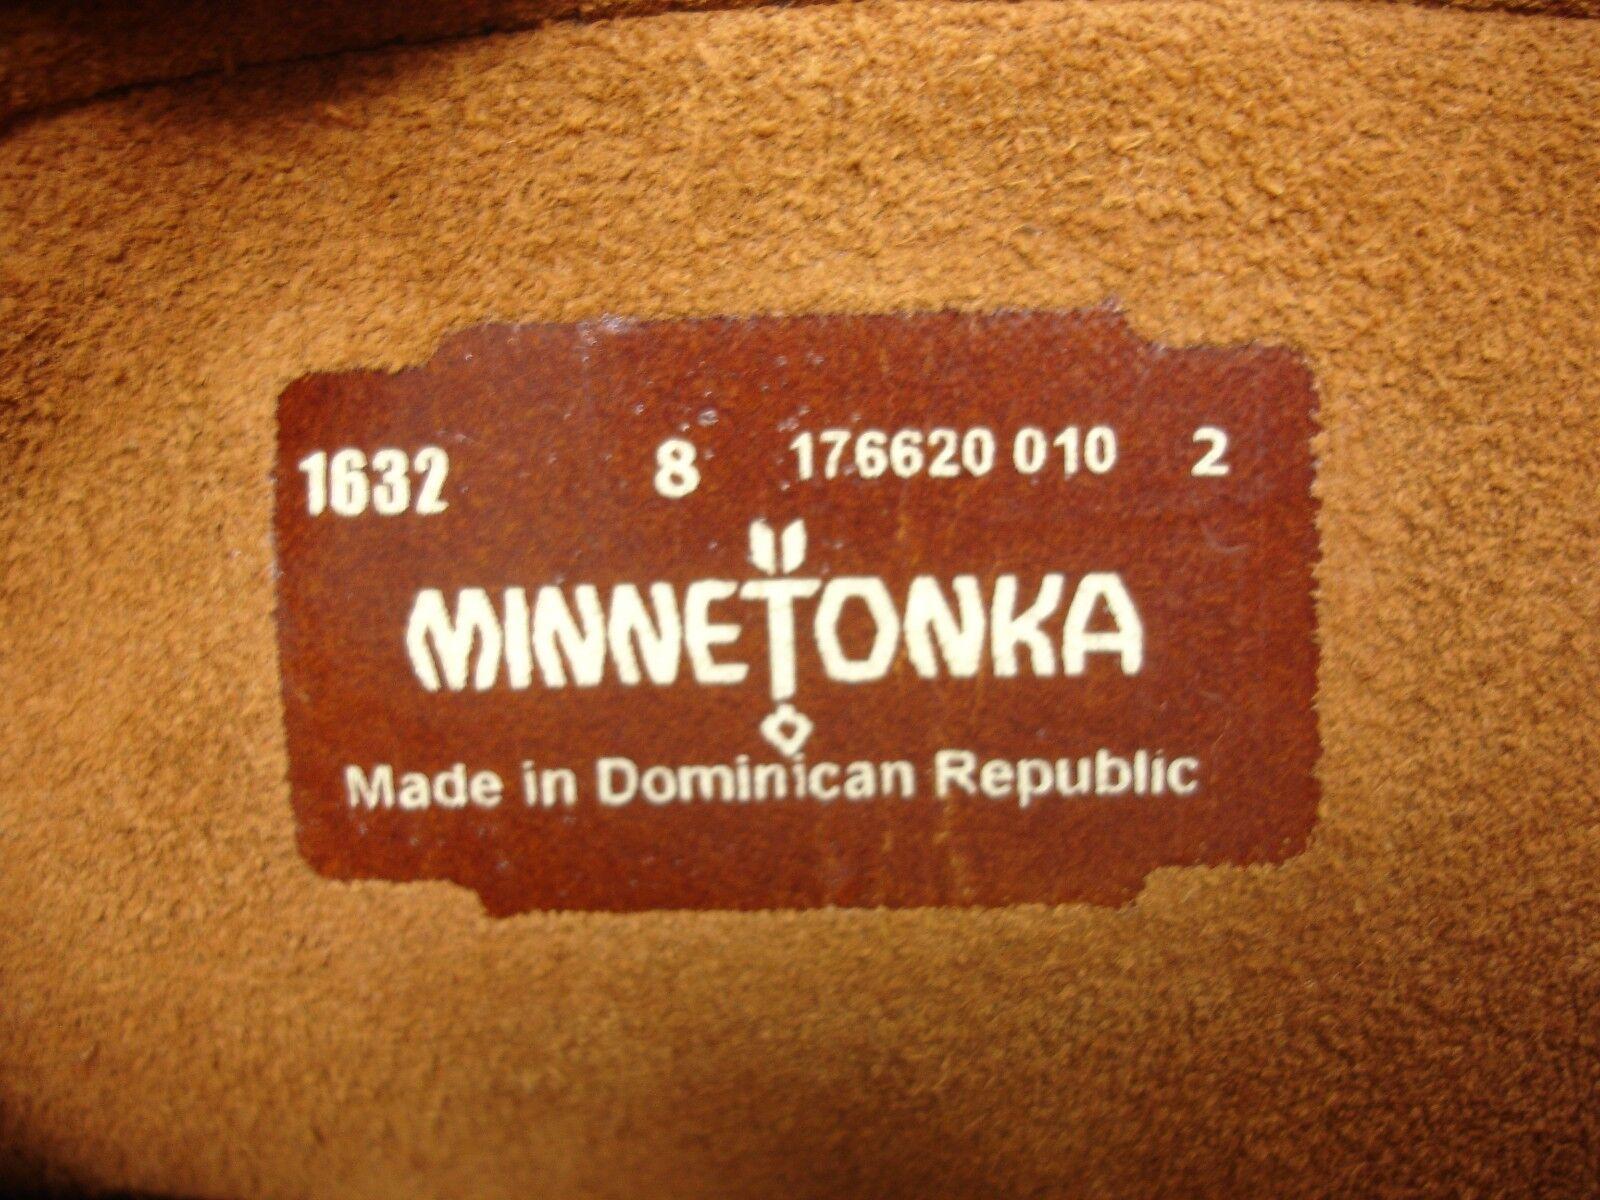 MINNETONKA MOCCASINS 1632 BROWN LAYER SUEDE 3 LAYER BROWN FRINGE CALF HIGH Stiefel WOMEN'S 8 e551e3